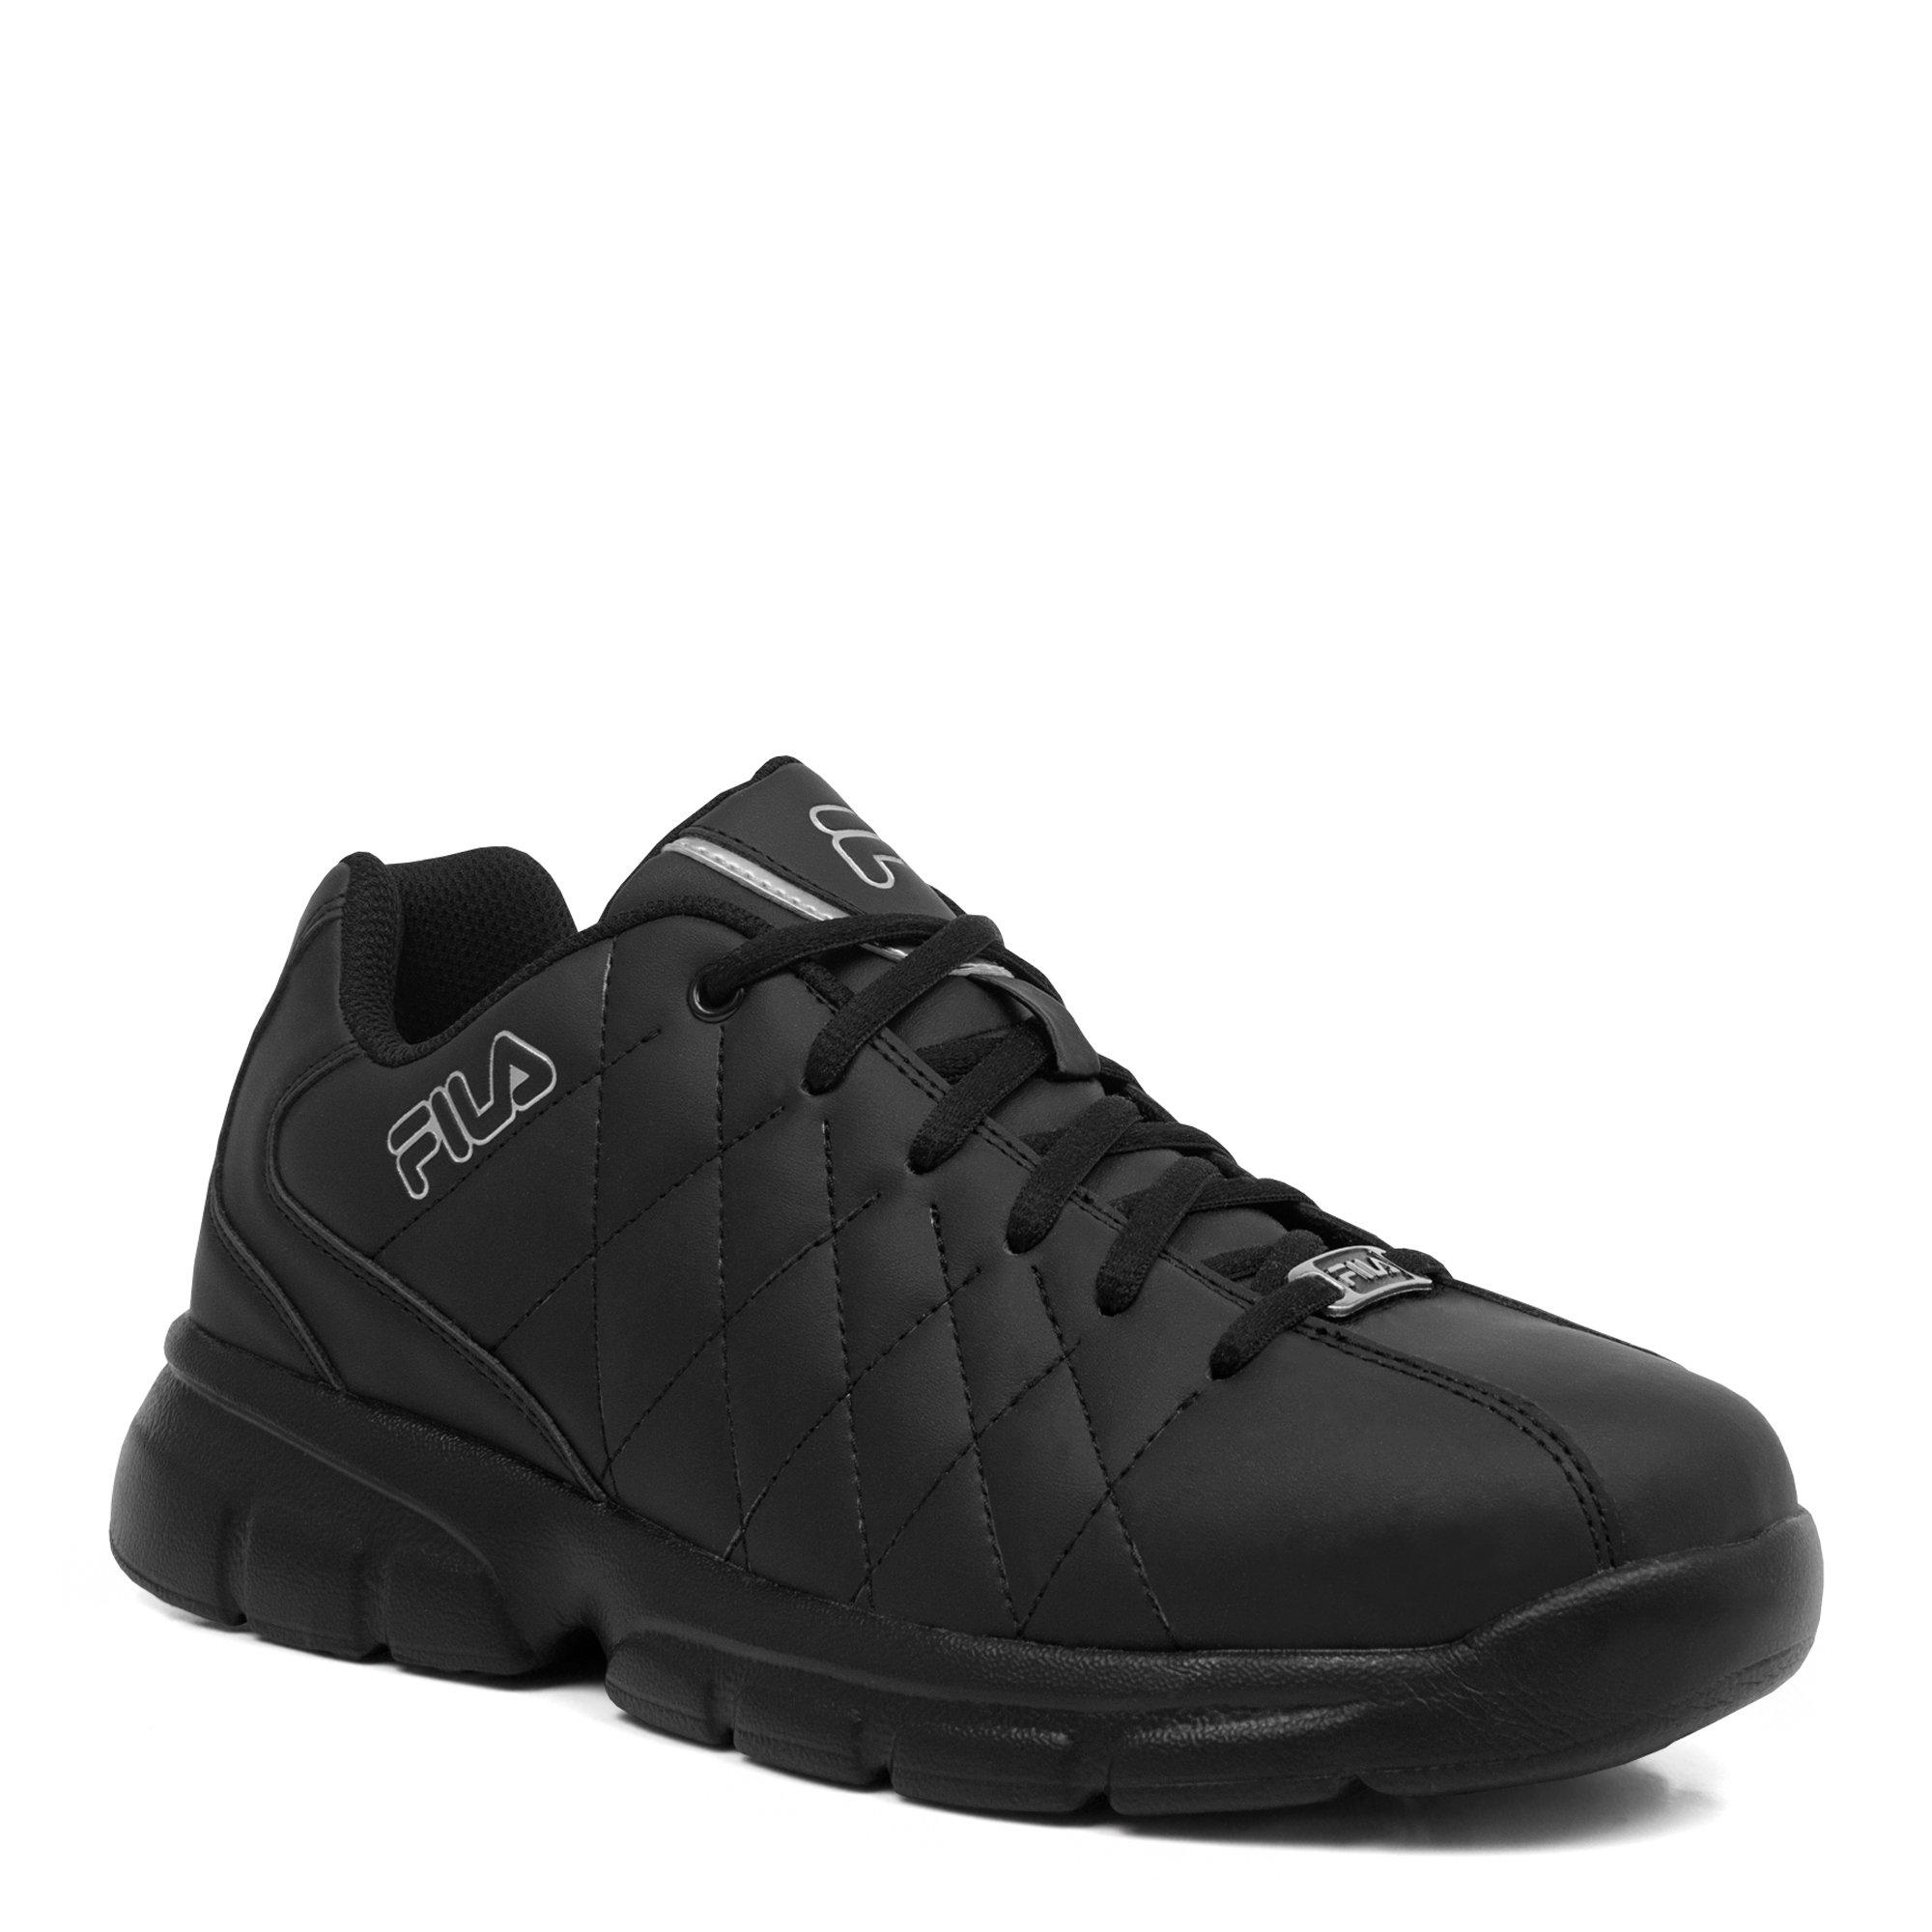 f86bef80b2 Galleon - Fila Men's Fulcrum 3 Training Shoe, Black/Black/Metallic Silver,  11 M US